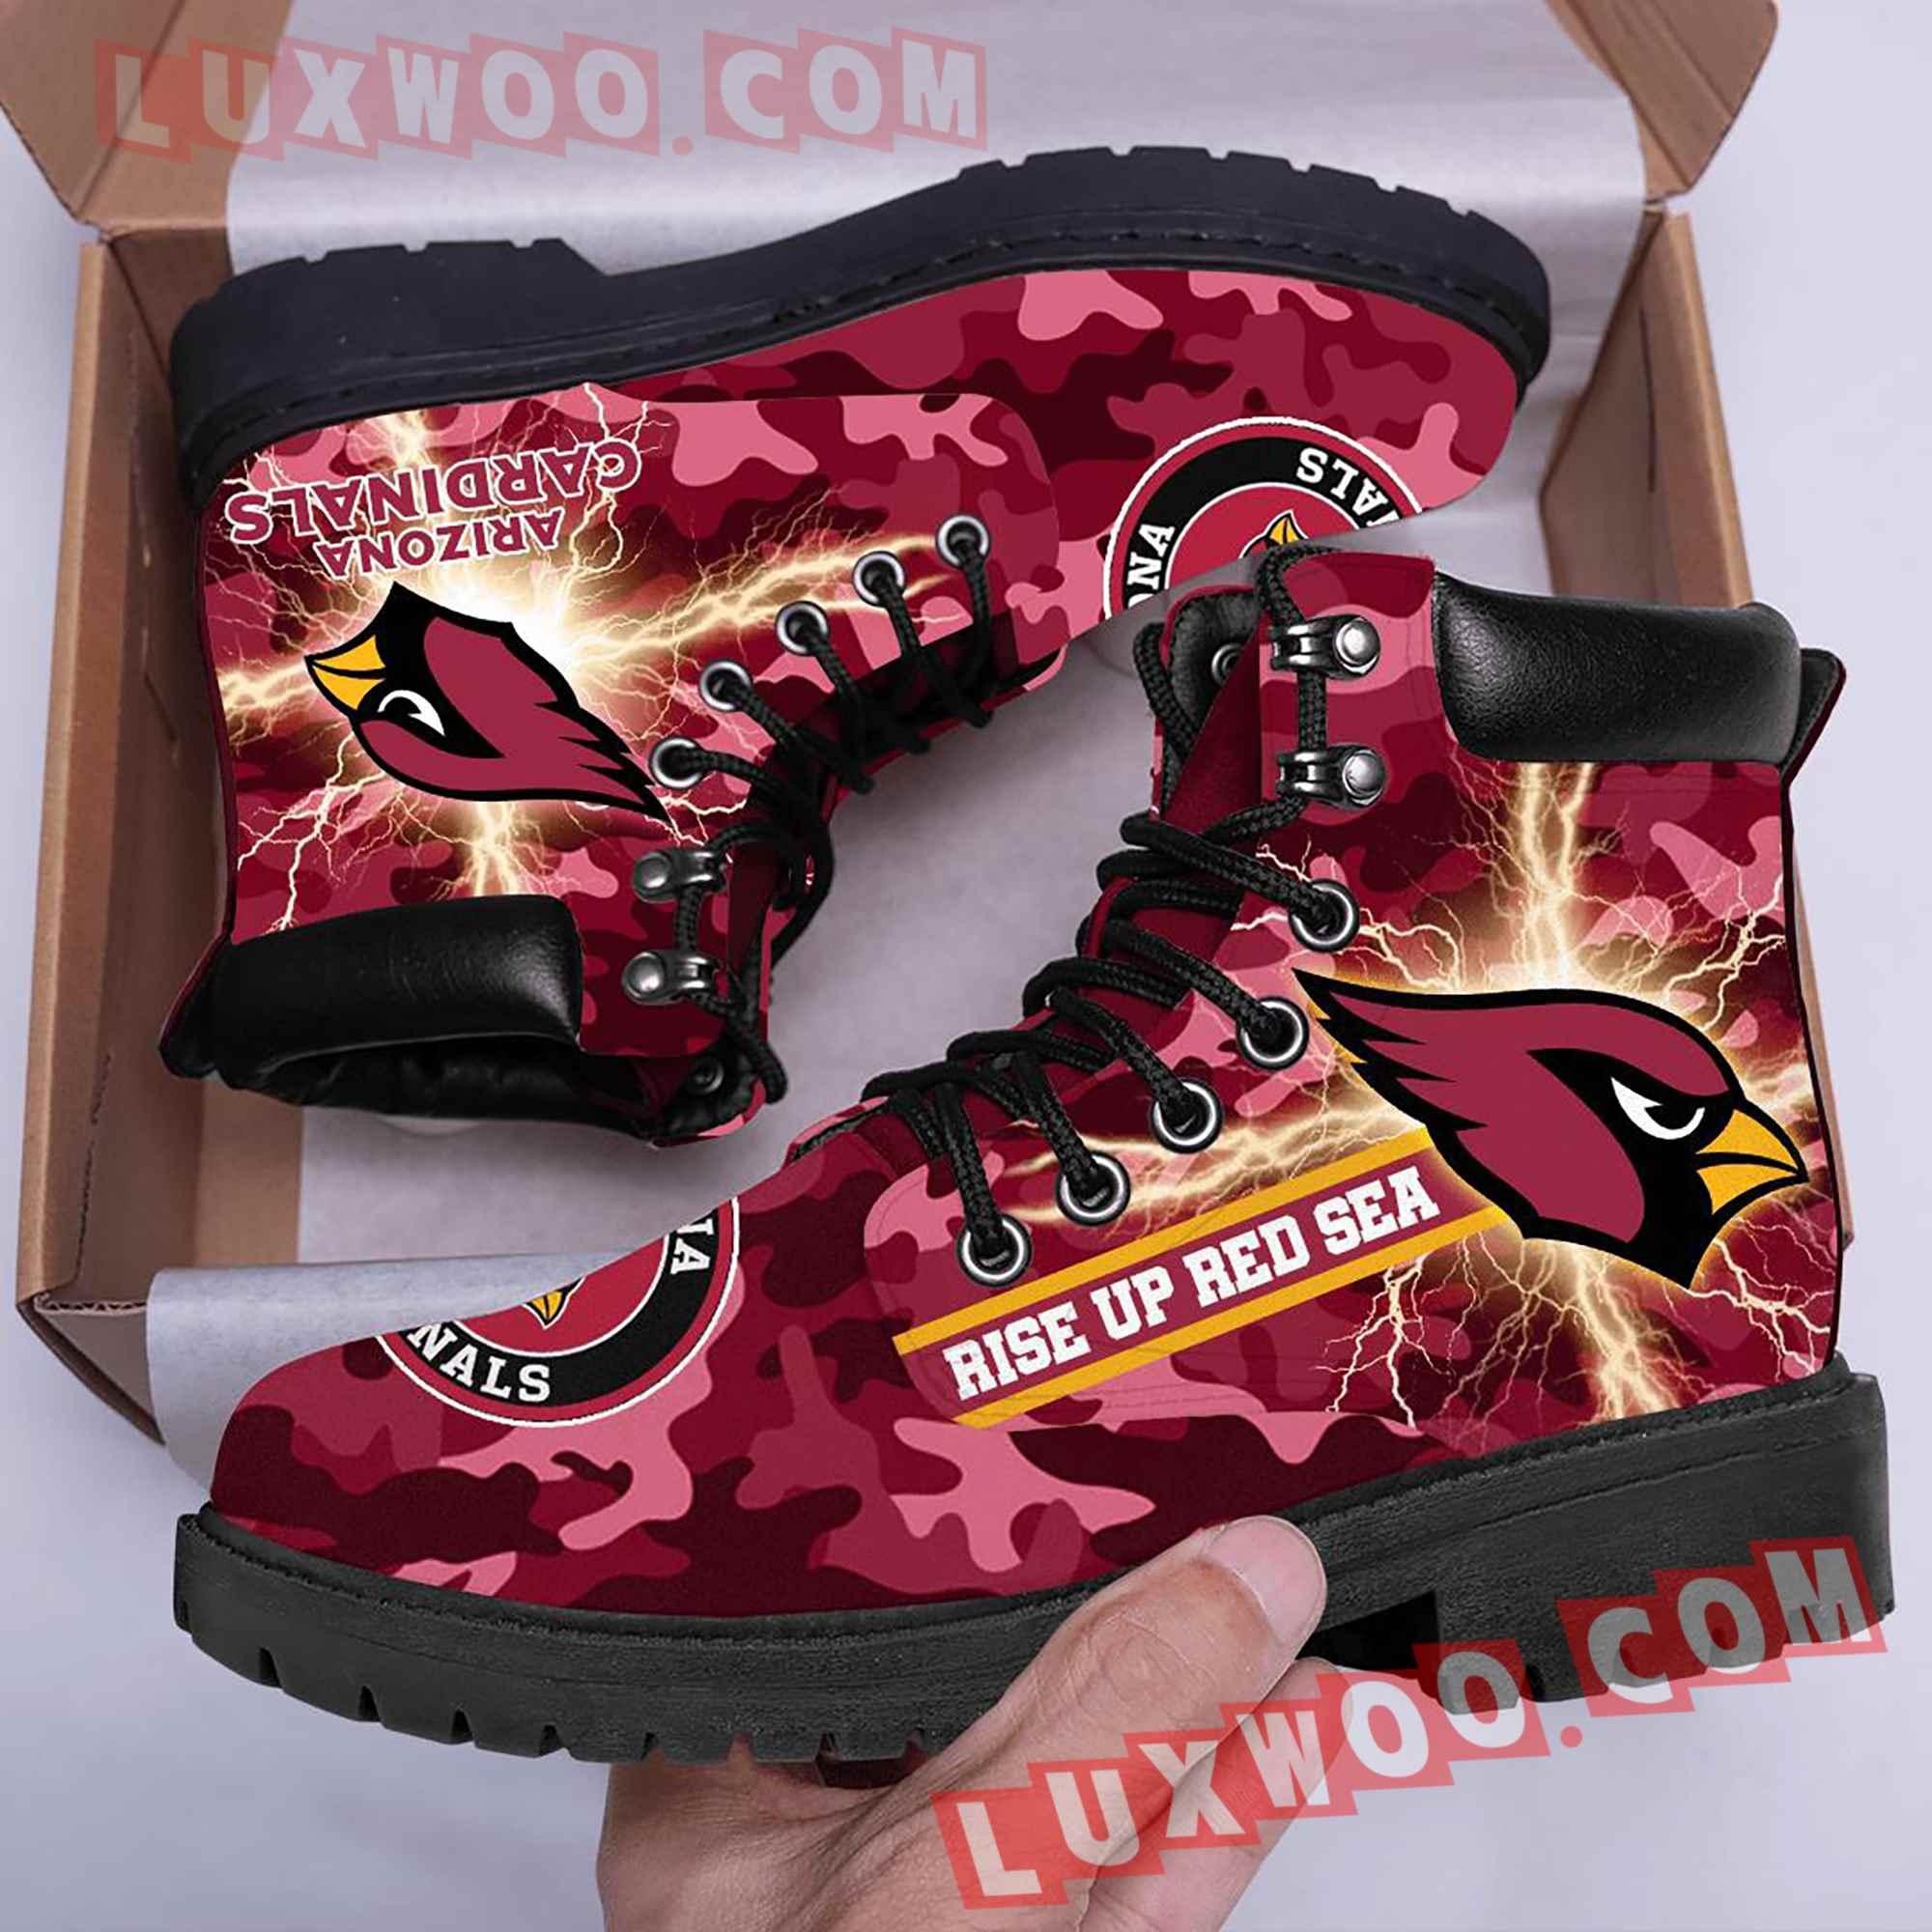 Arizona Cardinals Nfl Season Boots Shoes V2